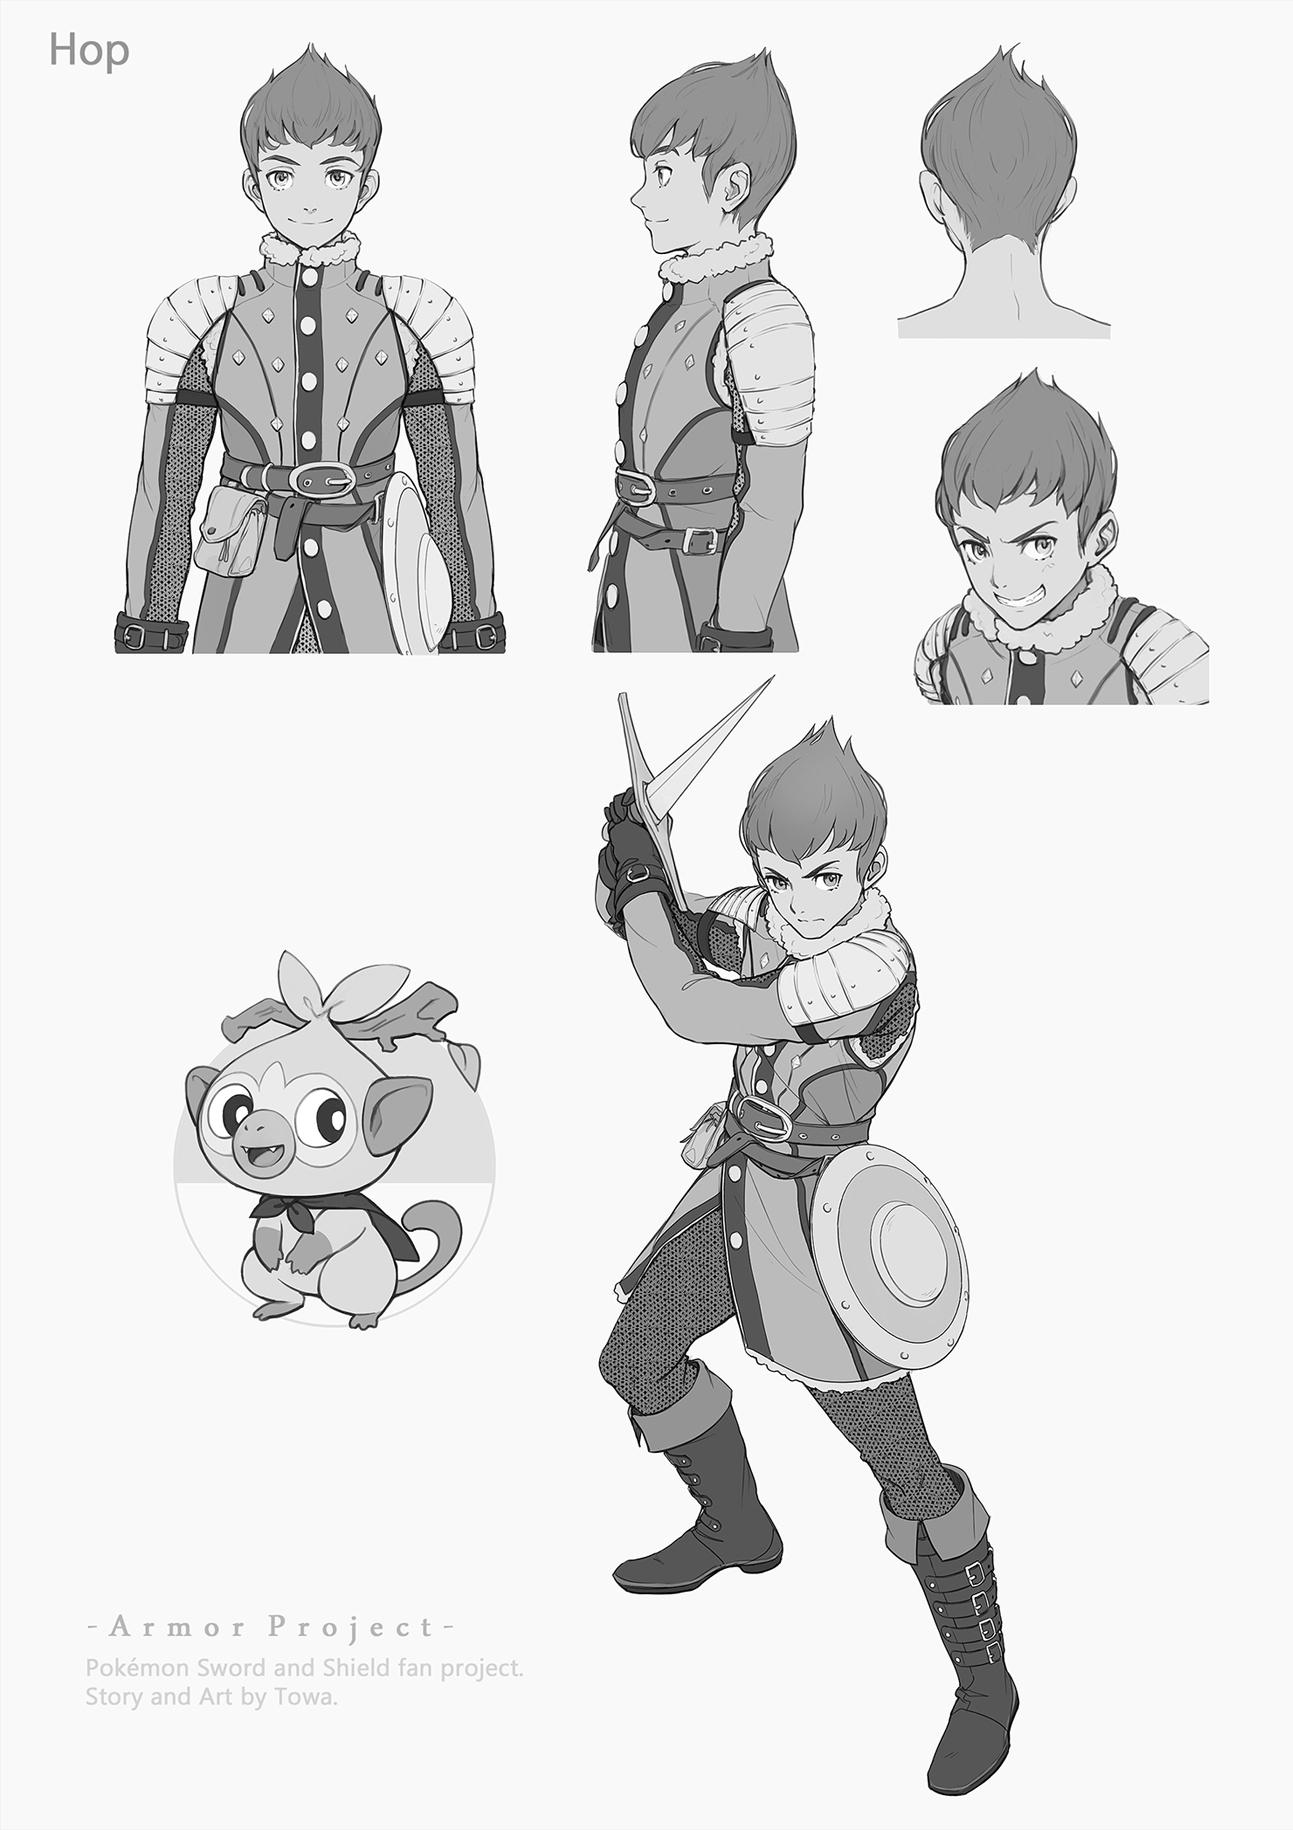 Pokémon-Zeichnung: Hop (Armor Project)